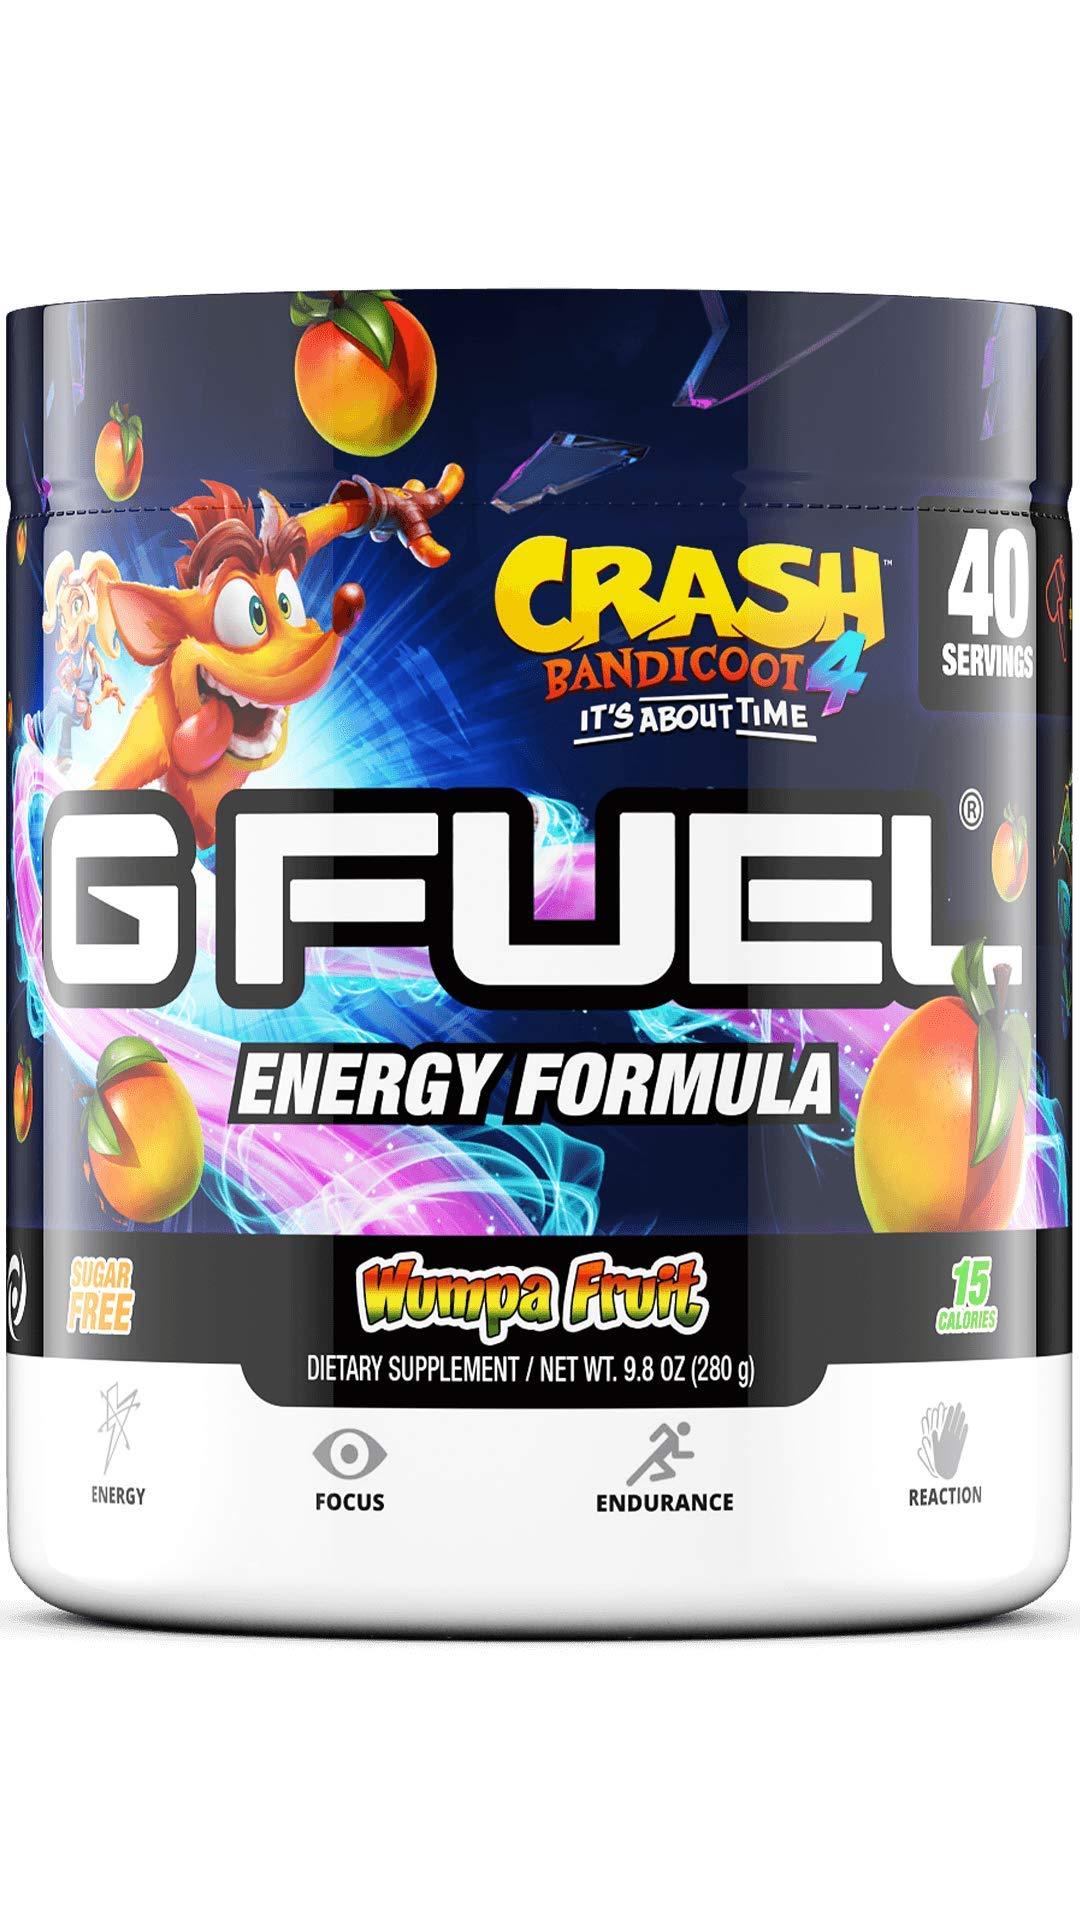 G Fuel Crash Bandicoot Wumpa Fruit (40 Servings) Elite Energy and Endurance Powder 9.8 oz.